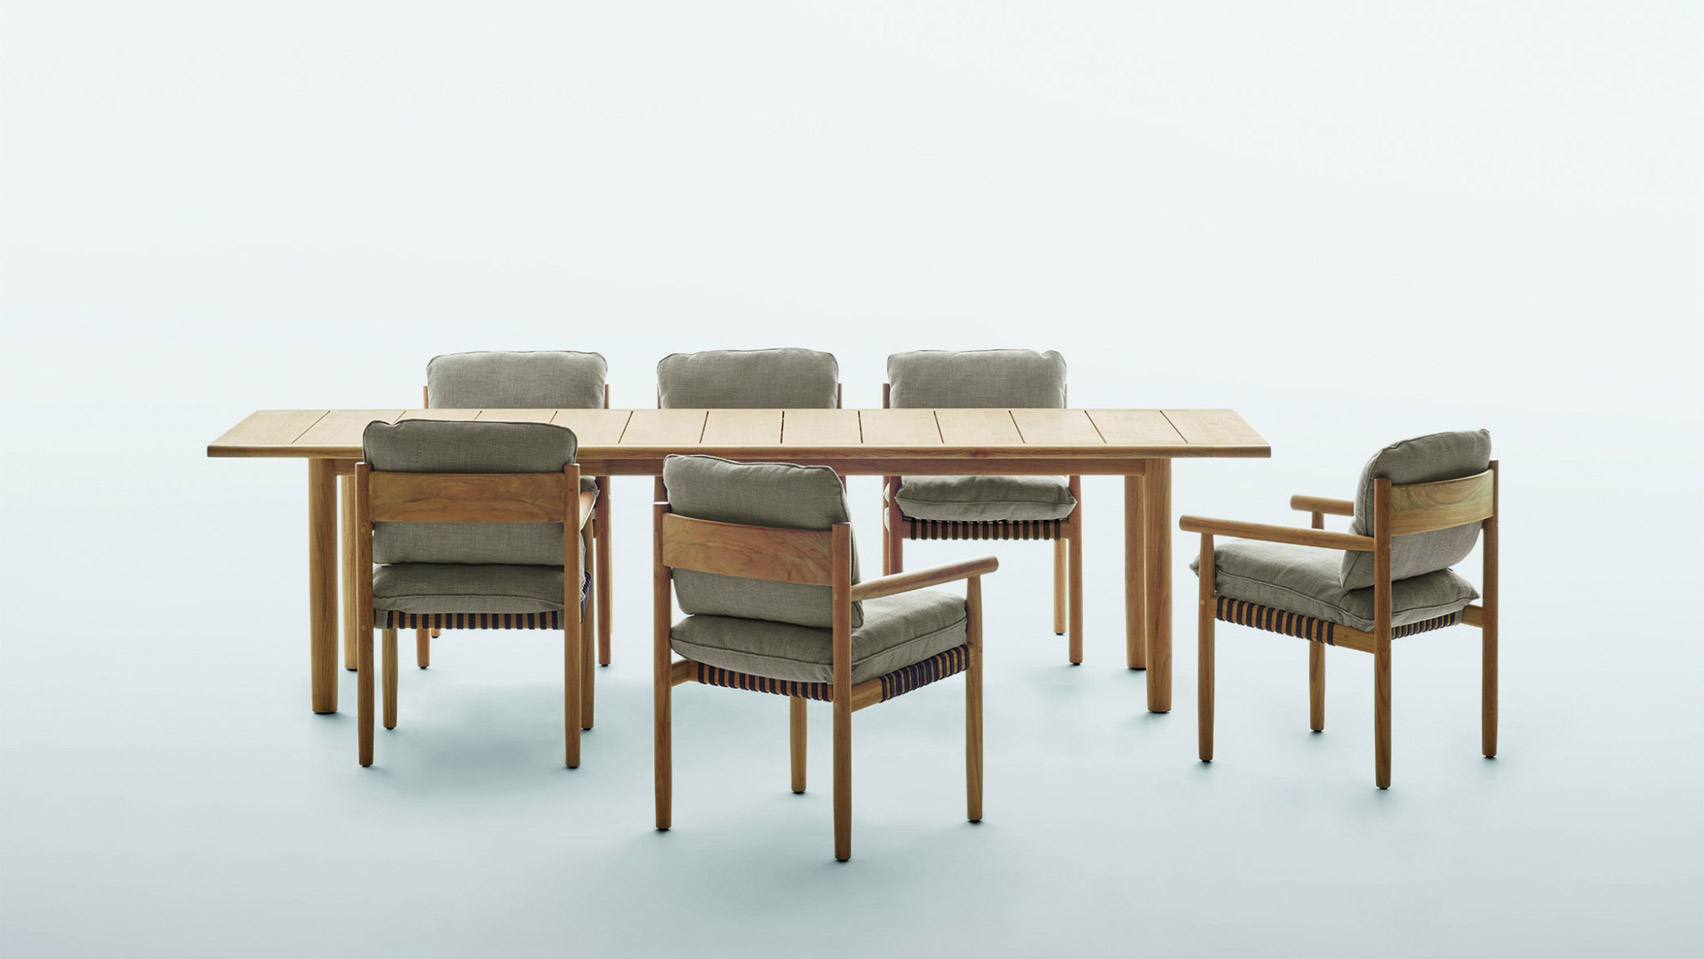 Tibbo armchair by Barber & Osgerby for Dedon